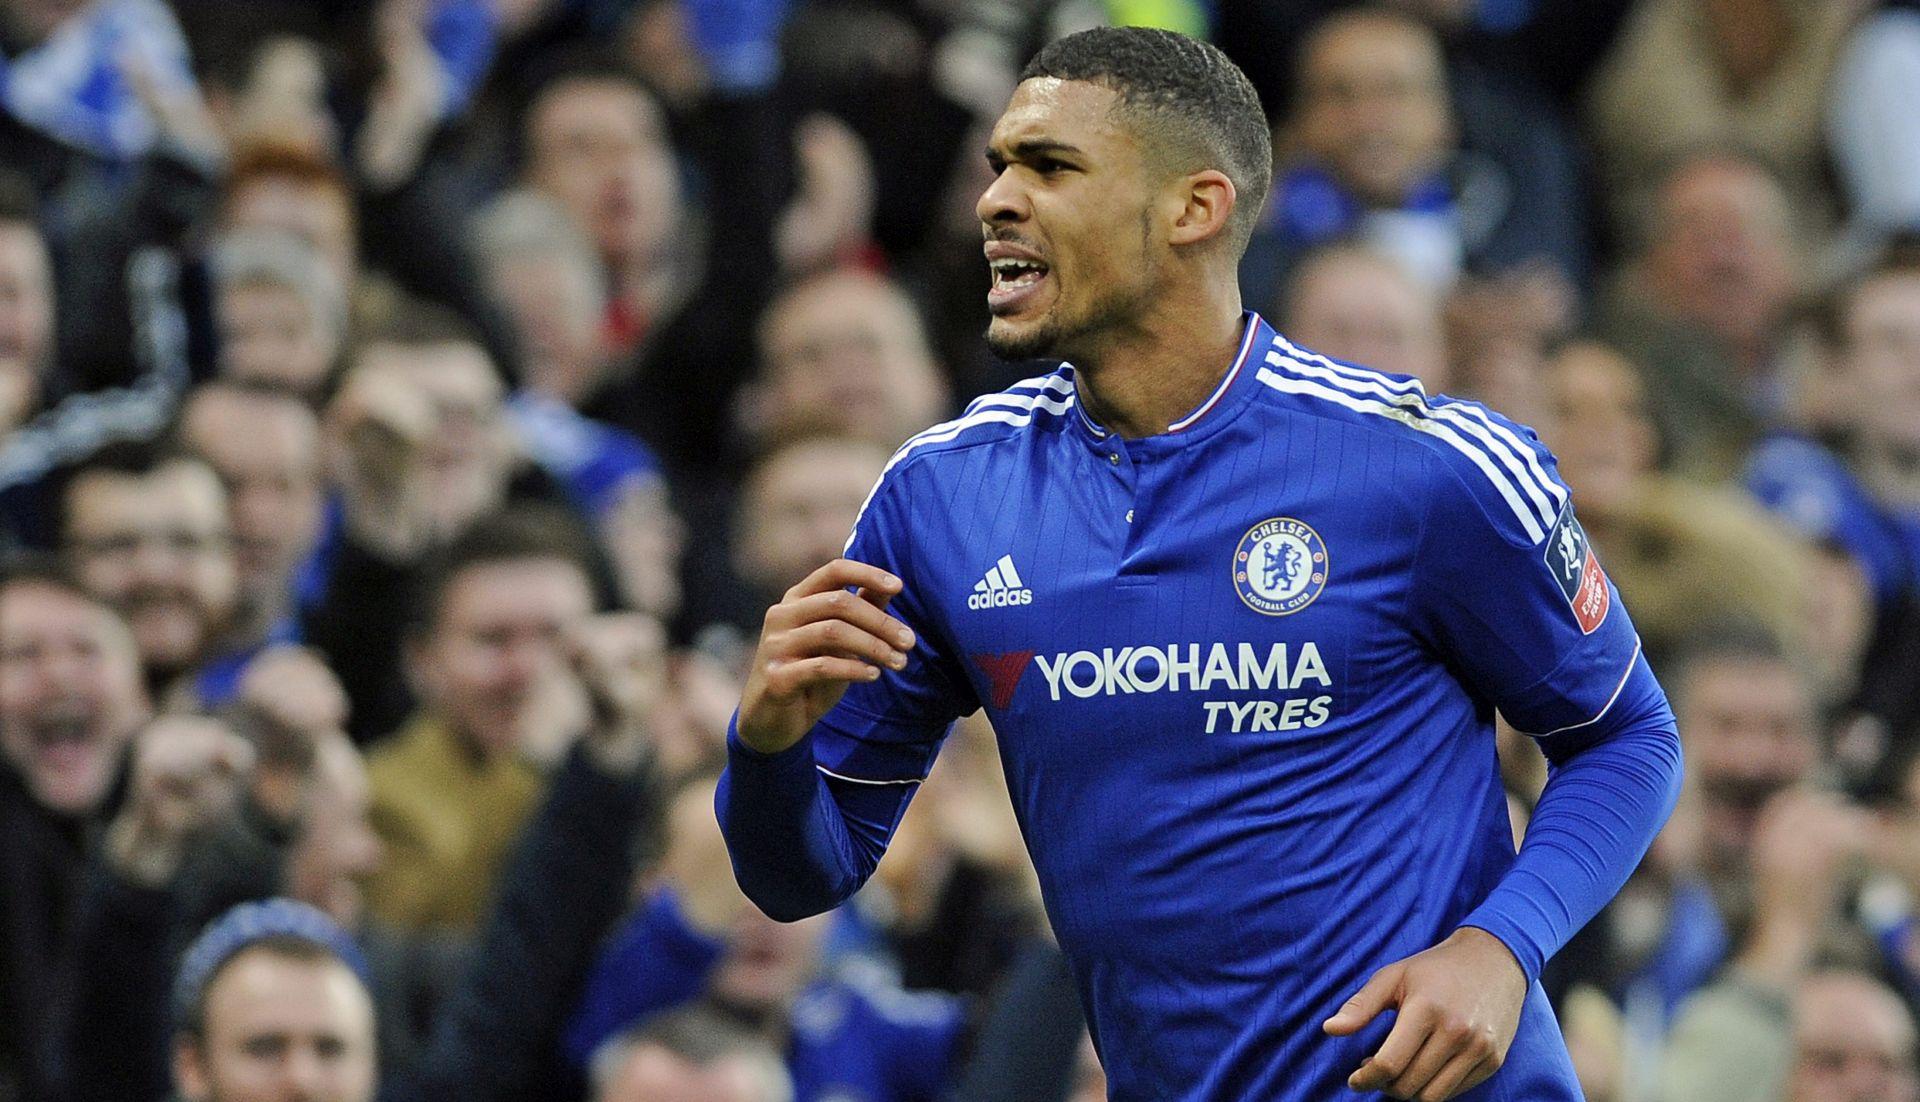 FA KUP Chelsea slavio, Tottenham i Leicester remizirali, Oxford izbacio Swansea